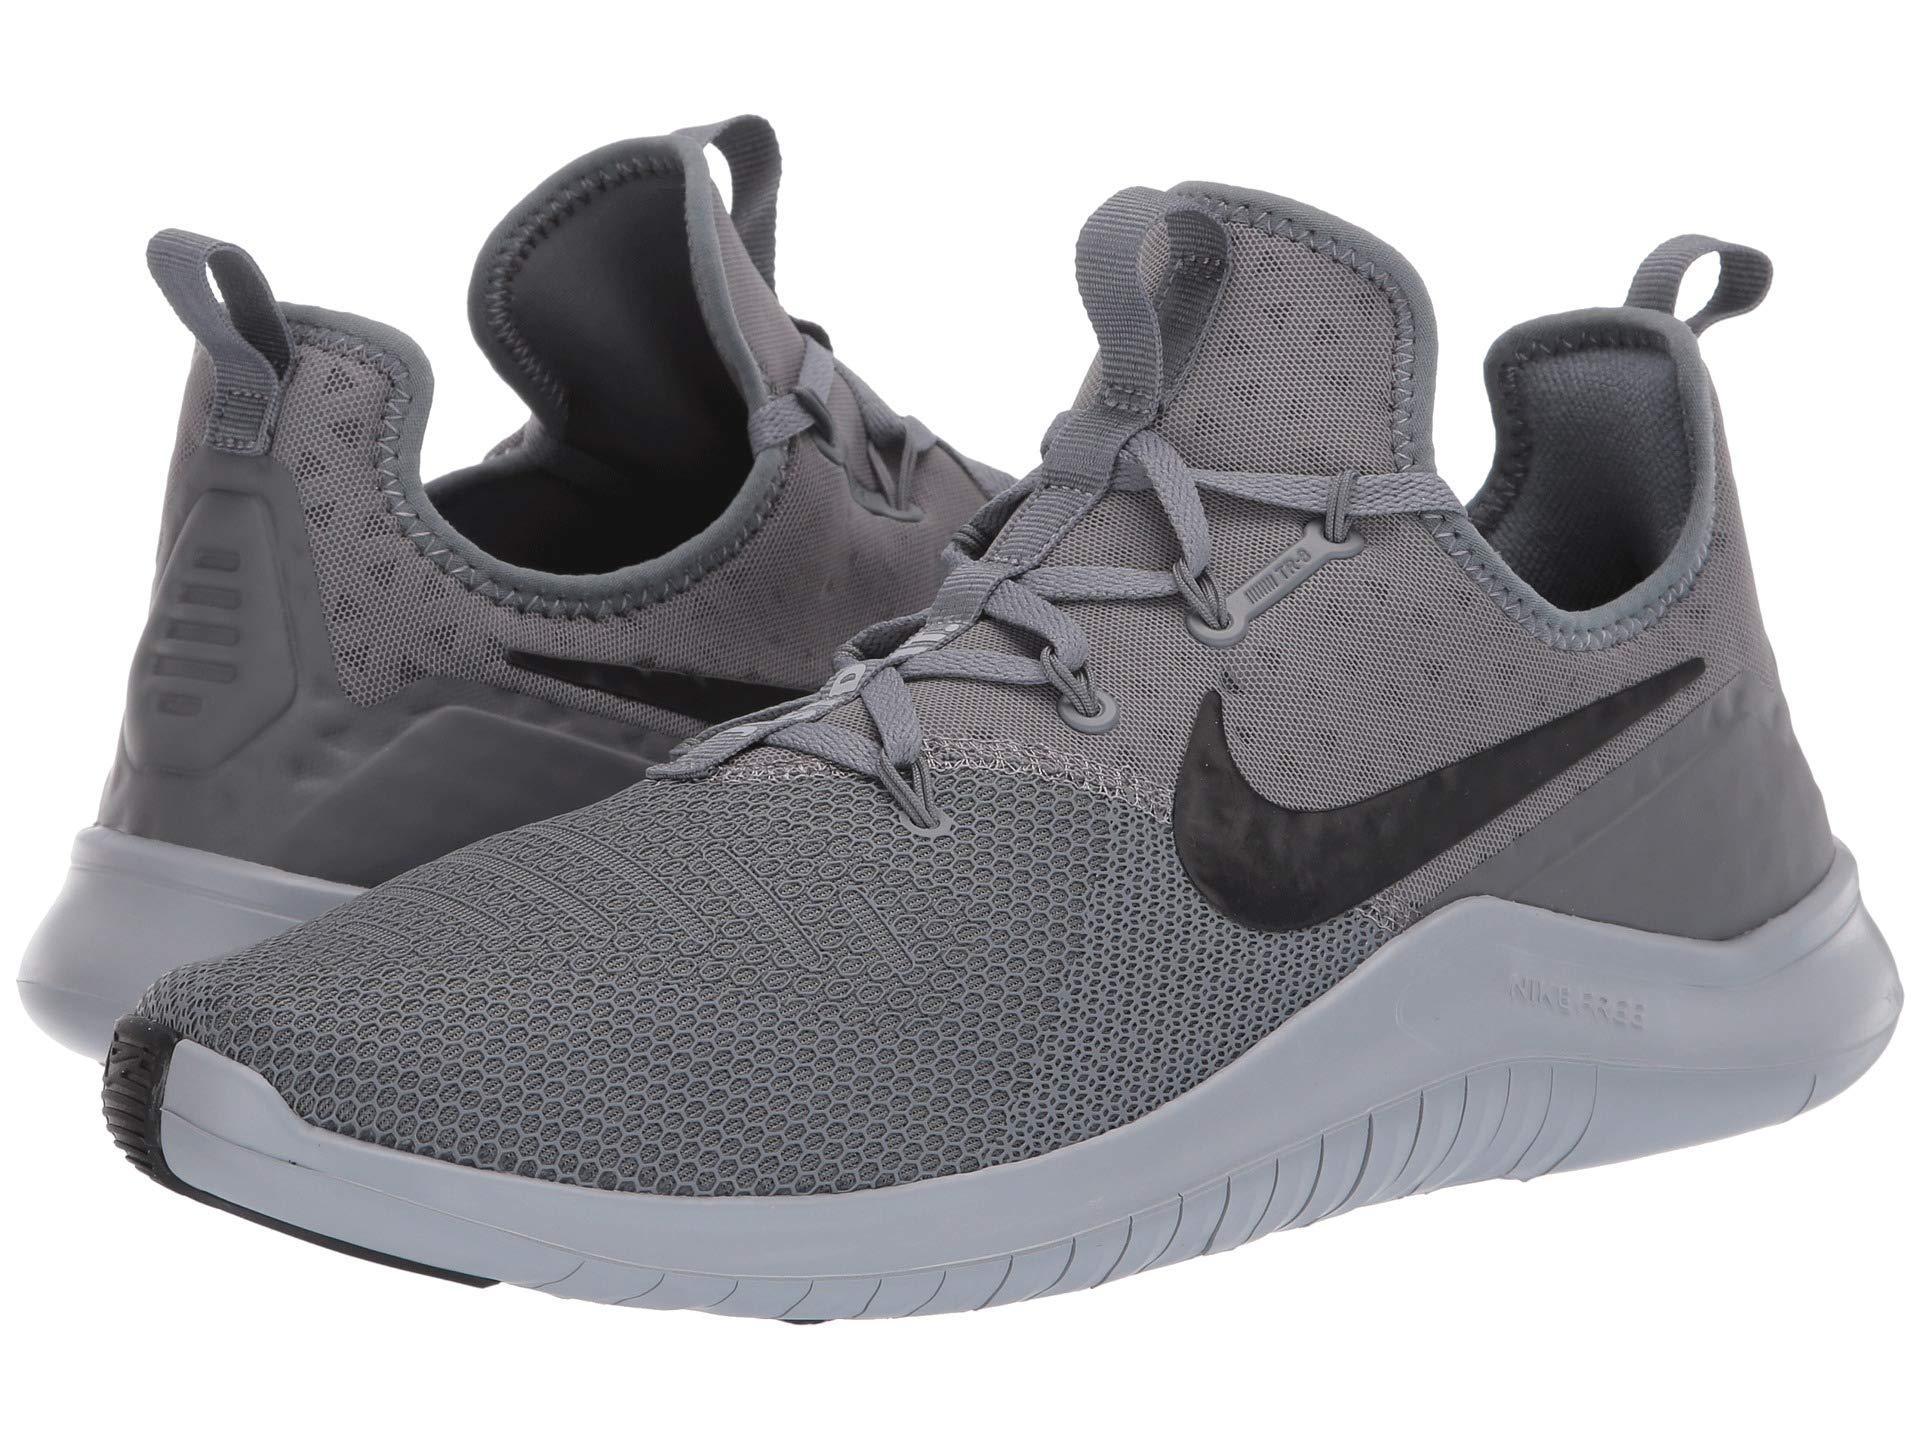 99e060f4039 Lyst - Nike Free Tr-8 (black black) Men s Cross Training Shoes in ...